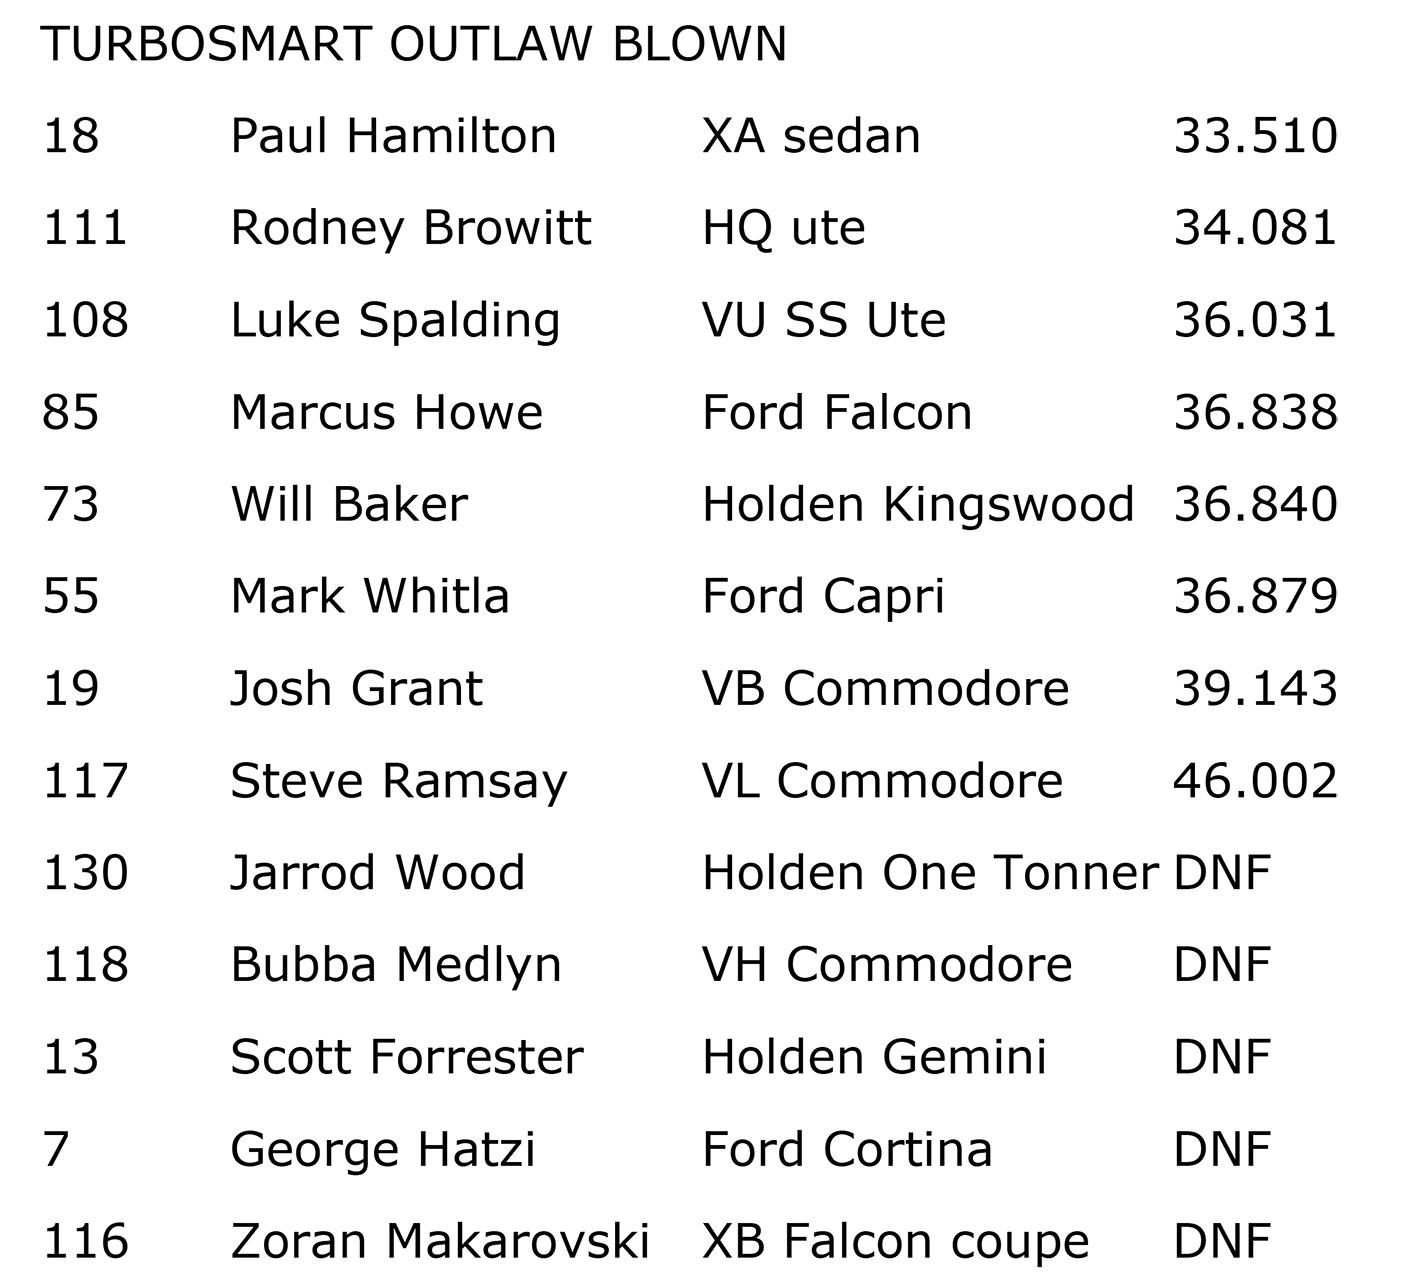 Turbosmart outlaw blown